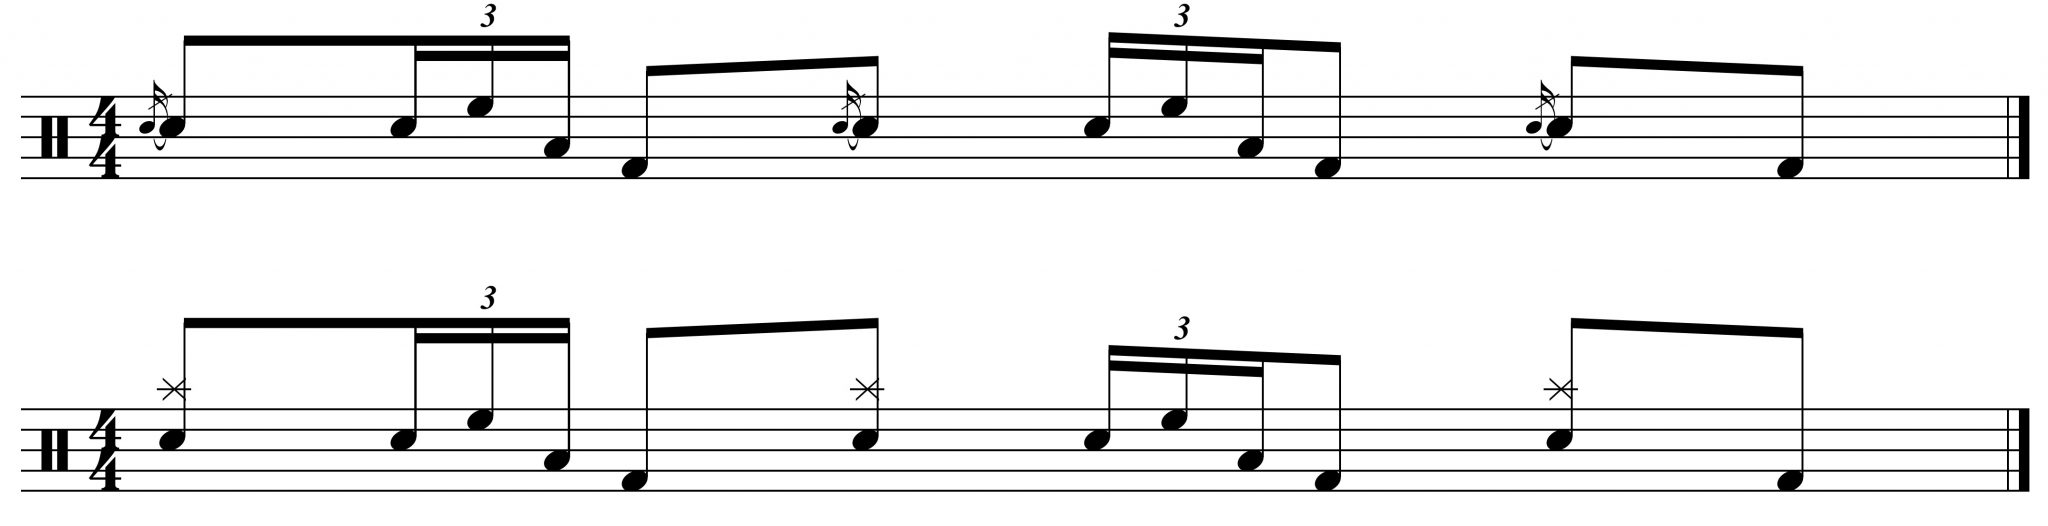 basic variations